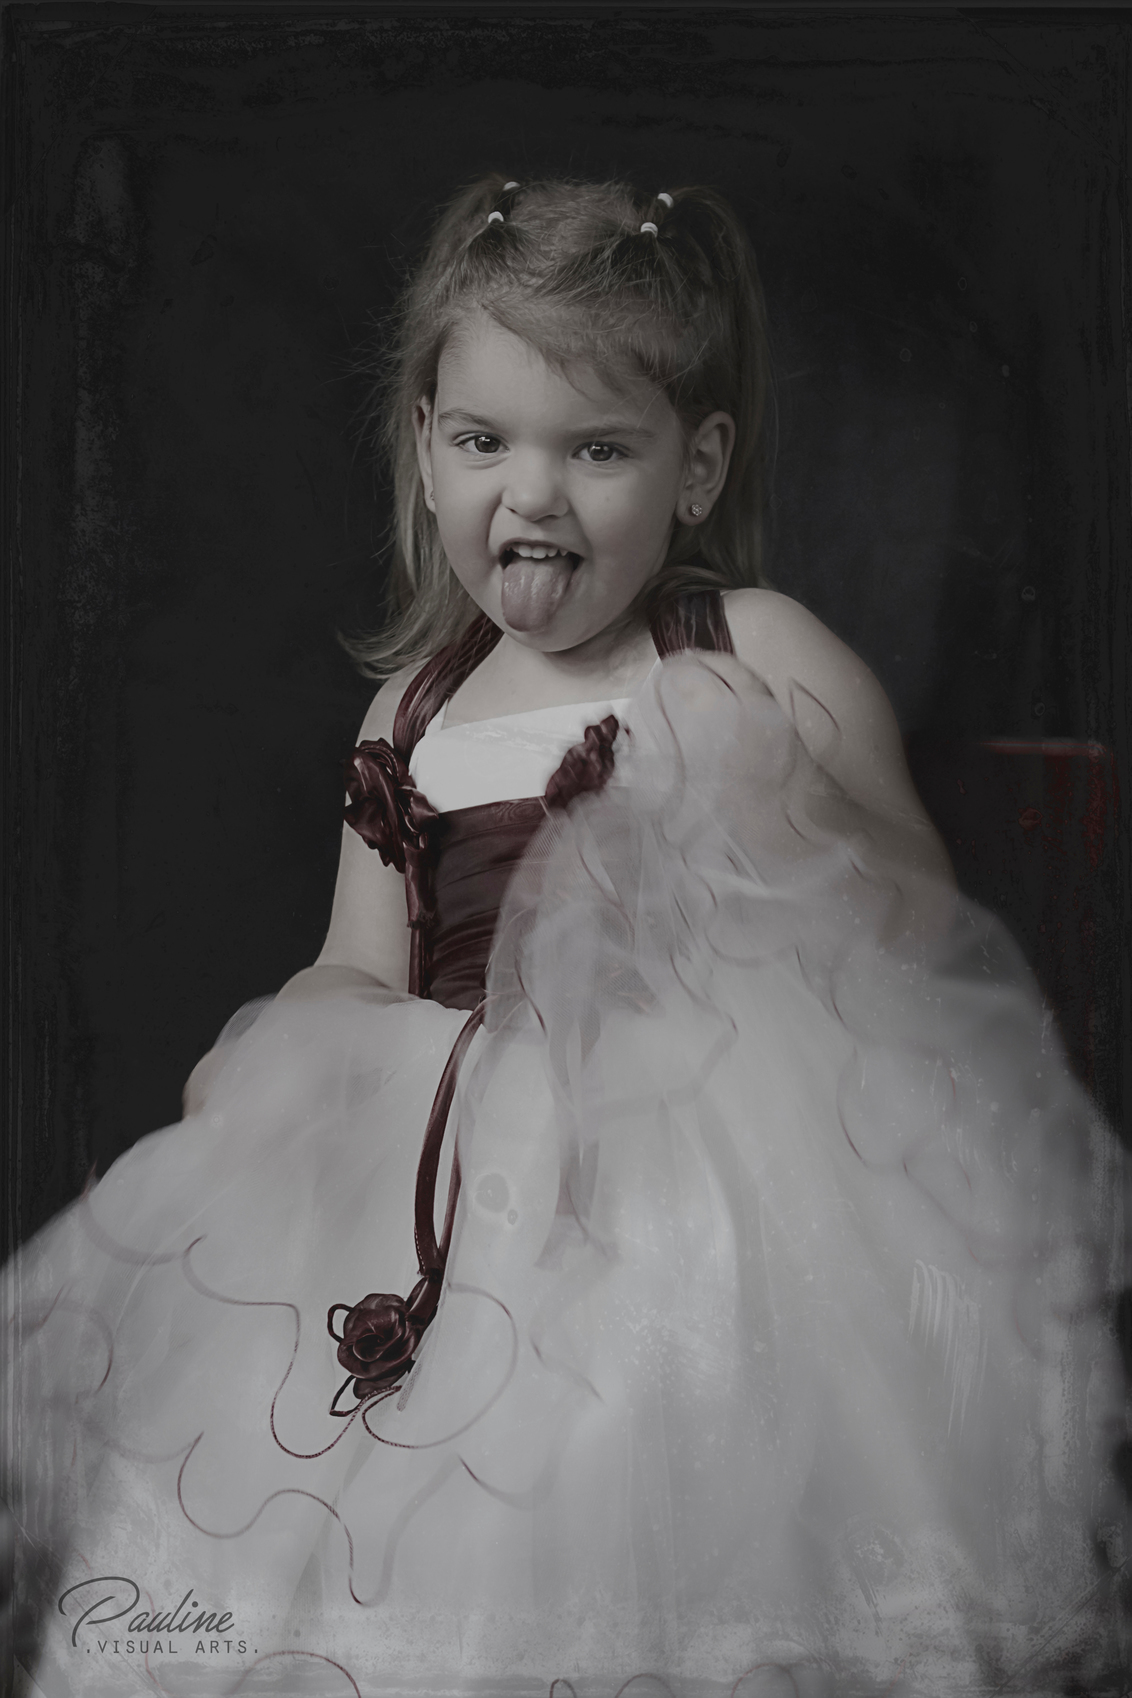 DIVA   KAYSLEY - © Pauline Visual Arts   http://www.paulinevisualarts.nl - foto door Pauline-VisualArts op 21-01-2017 - deze foto bevat: oud, mensen, donker, old, rotterdam, portret, antiek, model, daglicht, kind, kinderen, vintage, meisje, dame, mobiel, naakt, emotie, glamour, studio, photoshop, shoot, jurk, delft, fotoshoot, brutaal, kinderfotografie, prinses, visagie, locatie, lowkey, newborn, antique, cheeky, mobiele studio, Collodion, wetplate, tintype